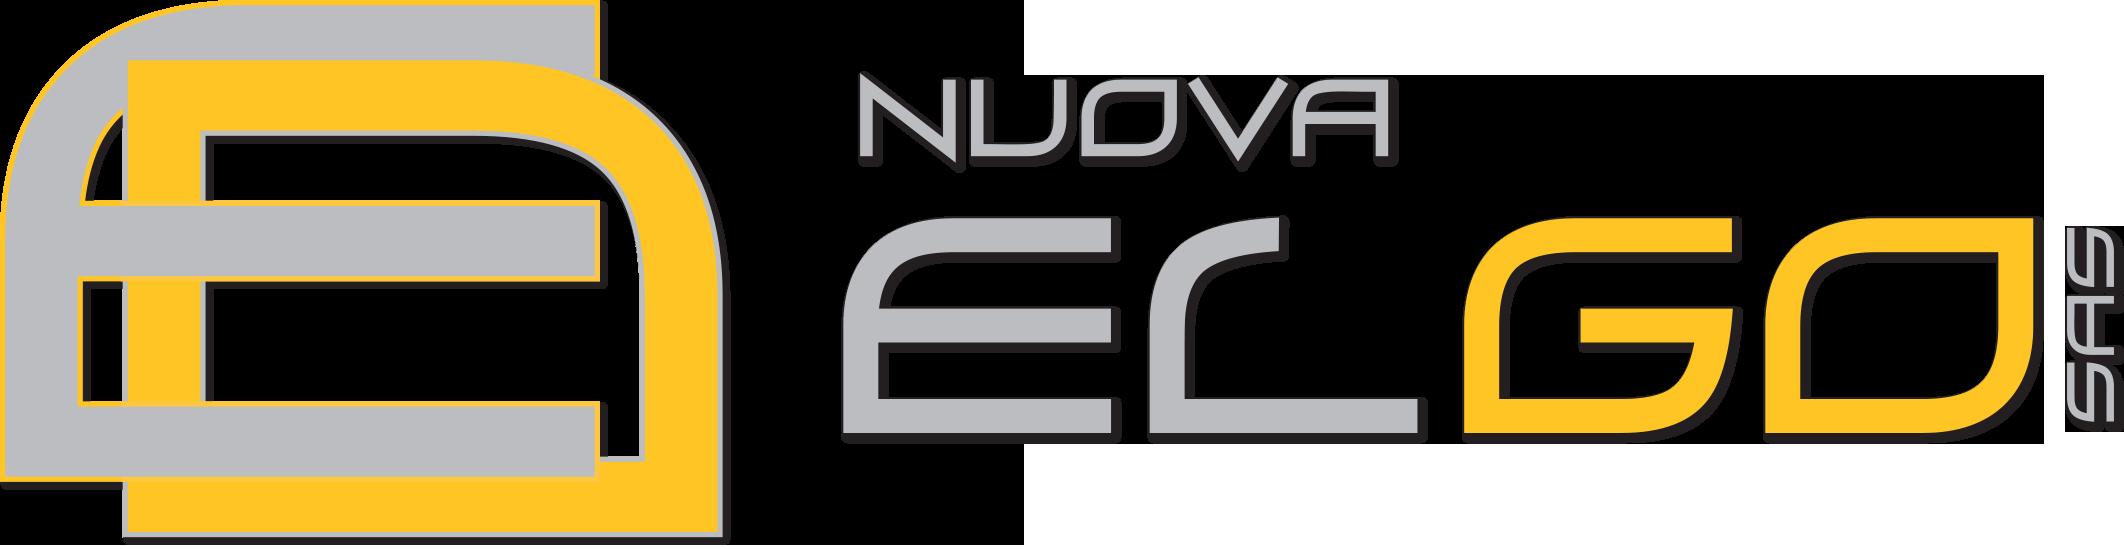 Nuova Elgo logo